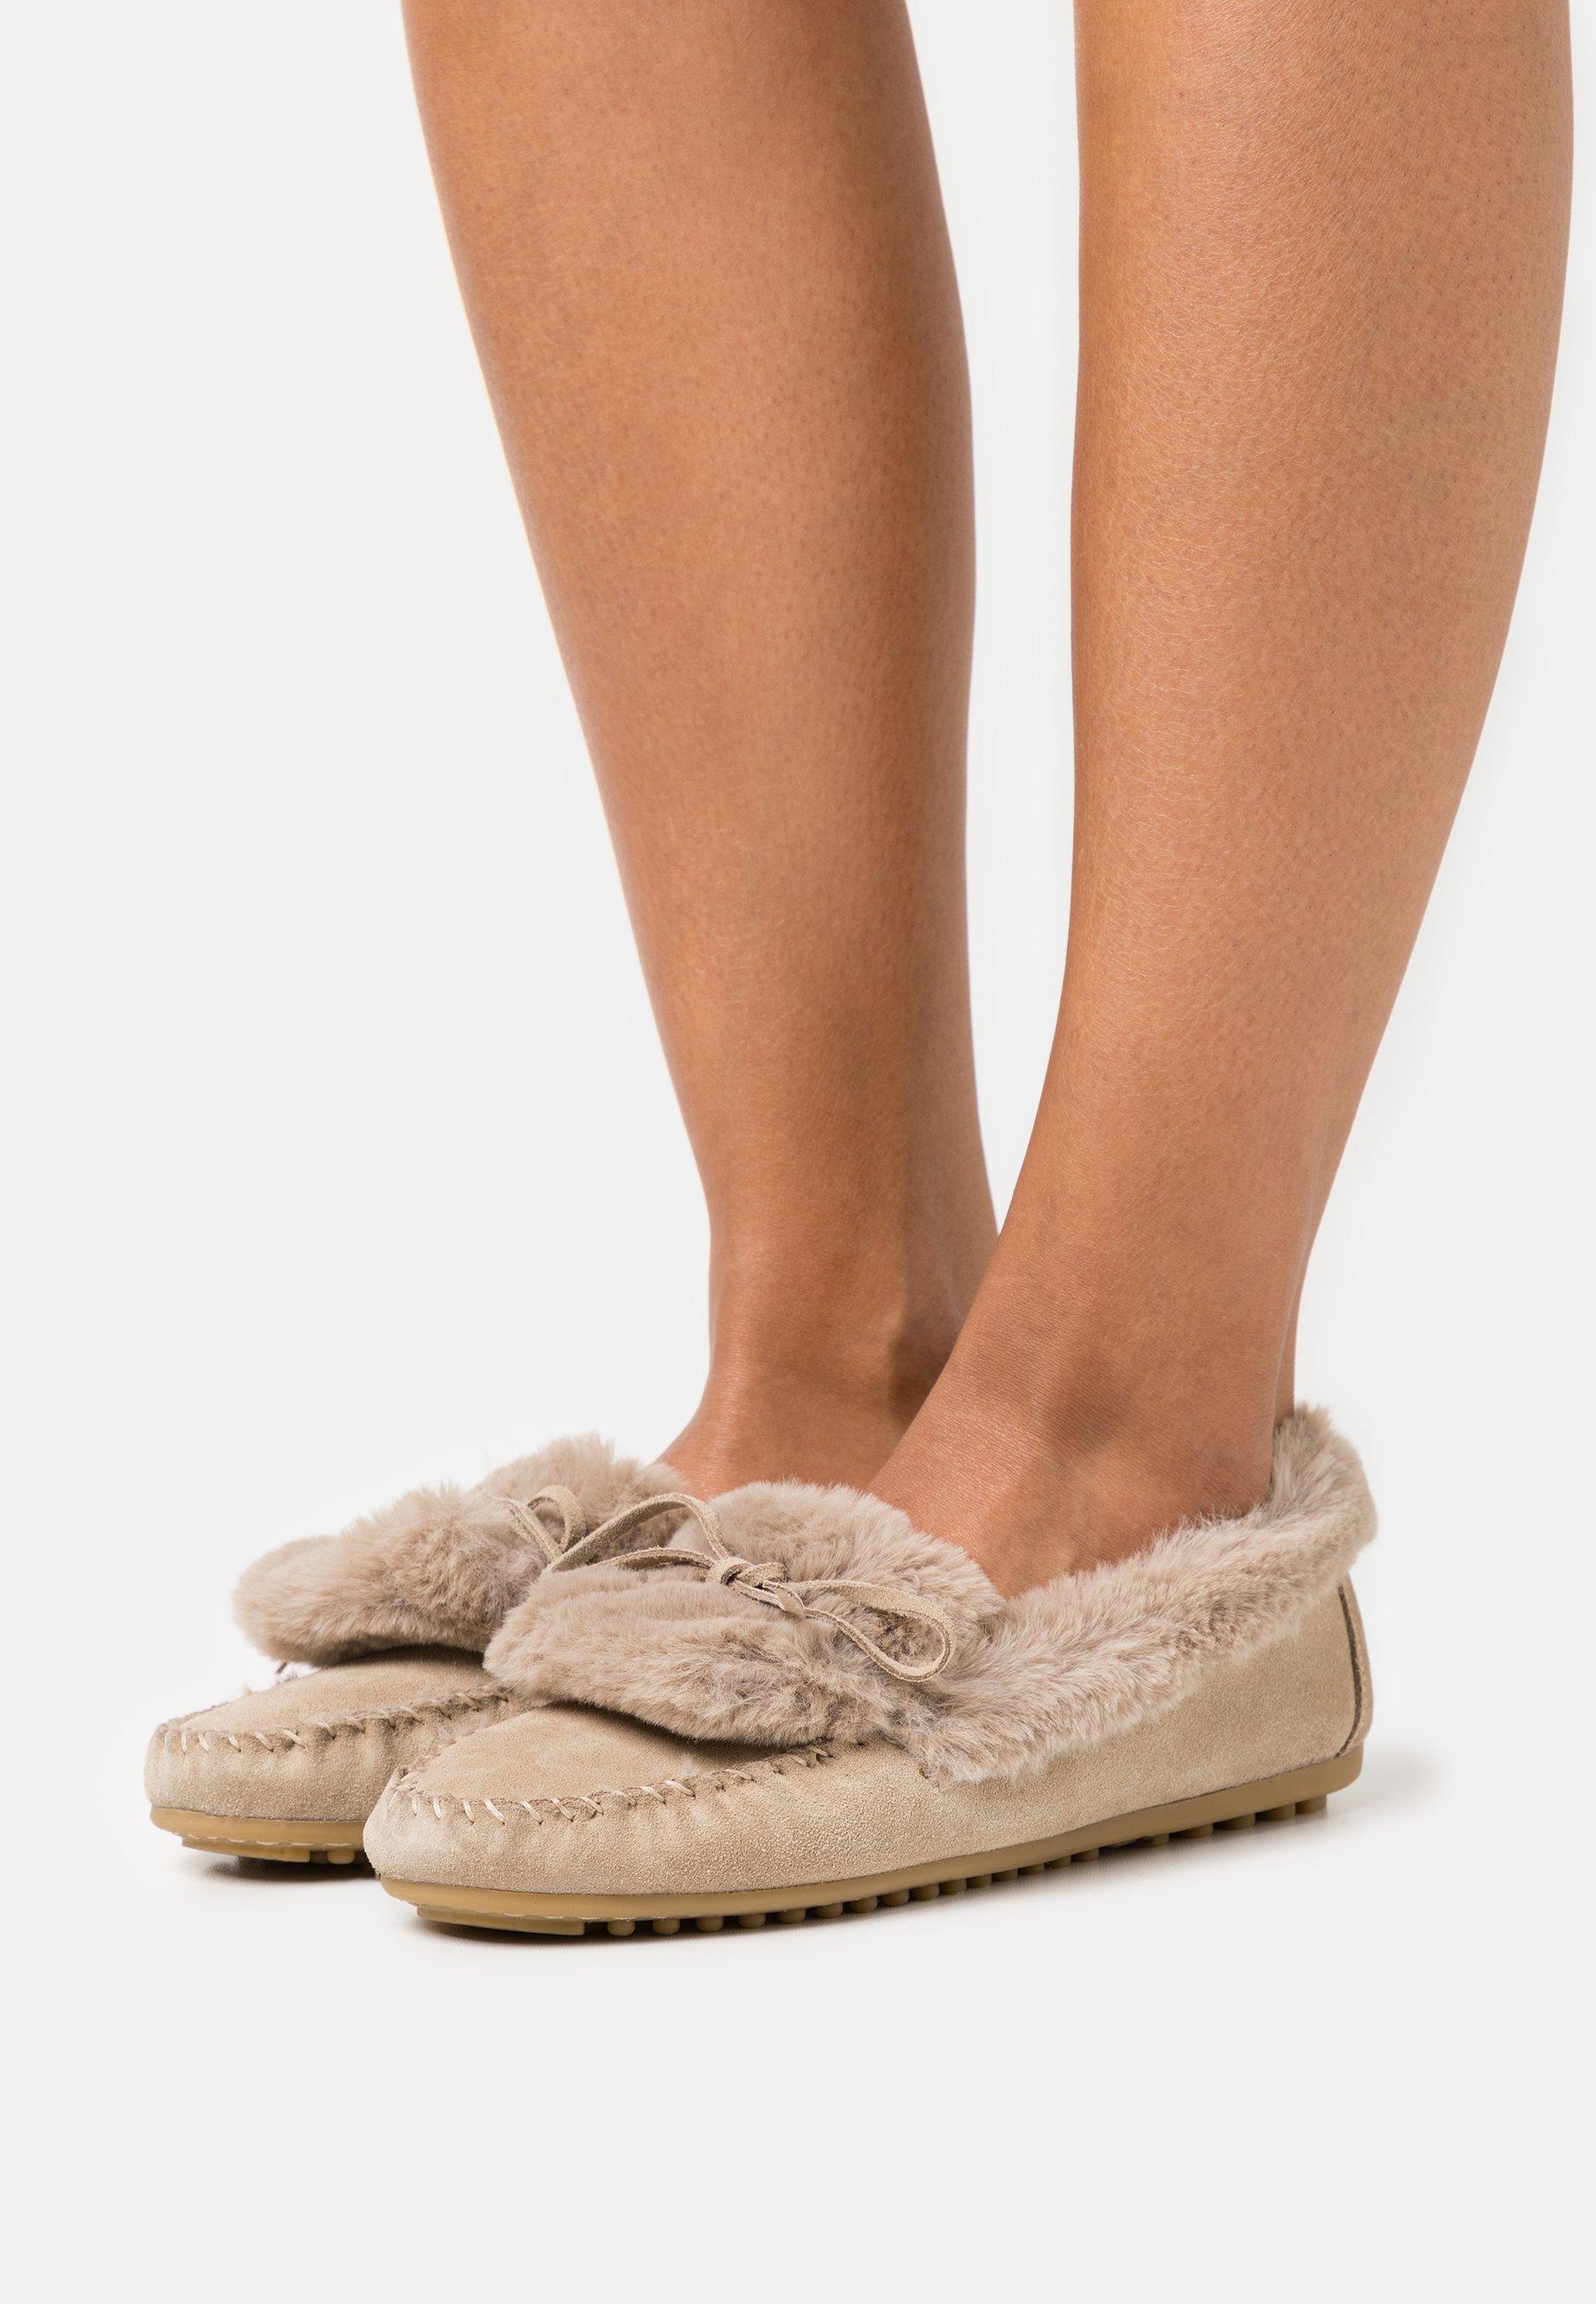 Women COMFORT LEATHER - Slippers - beige